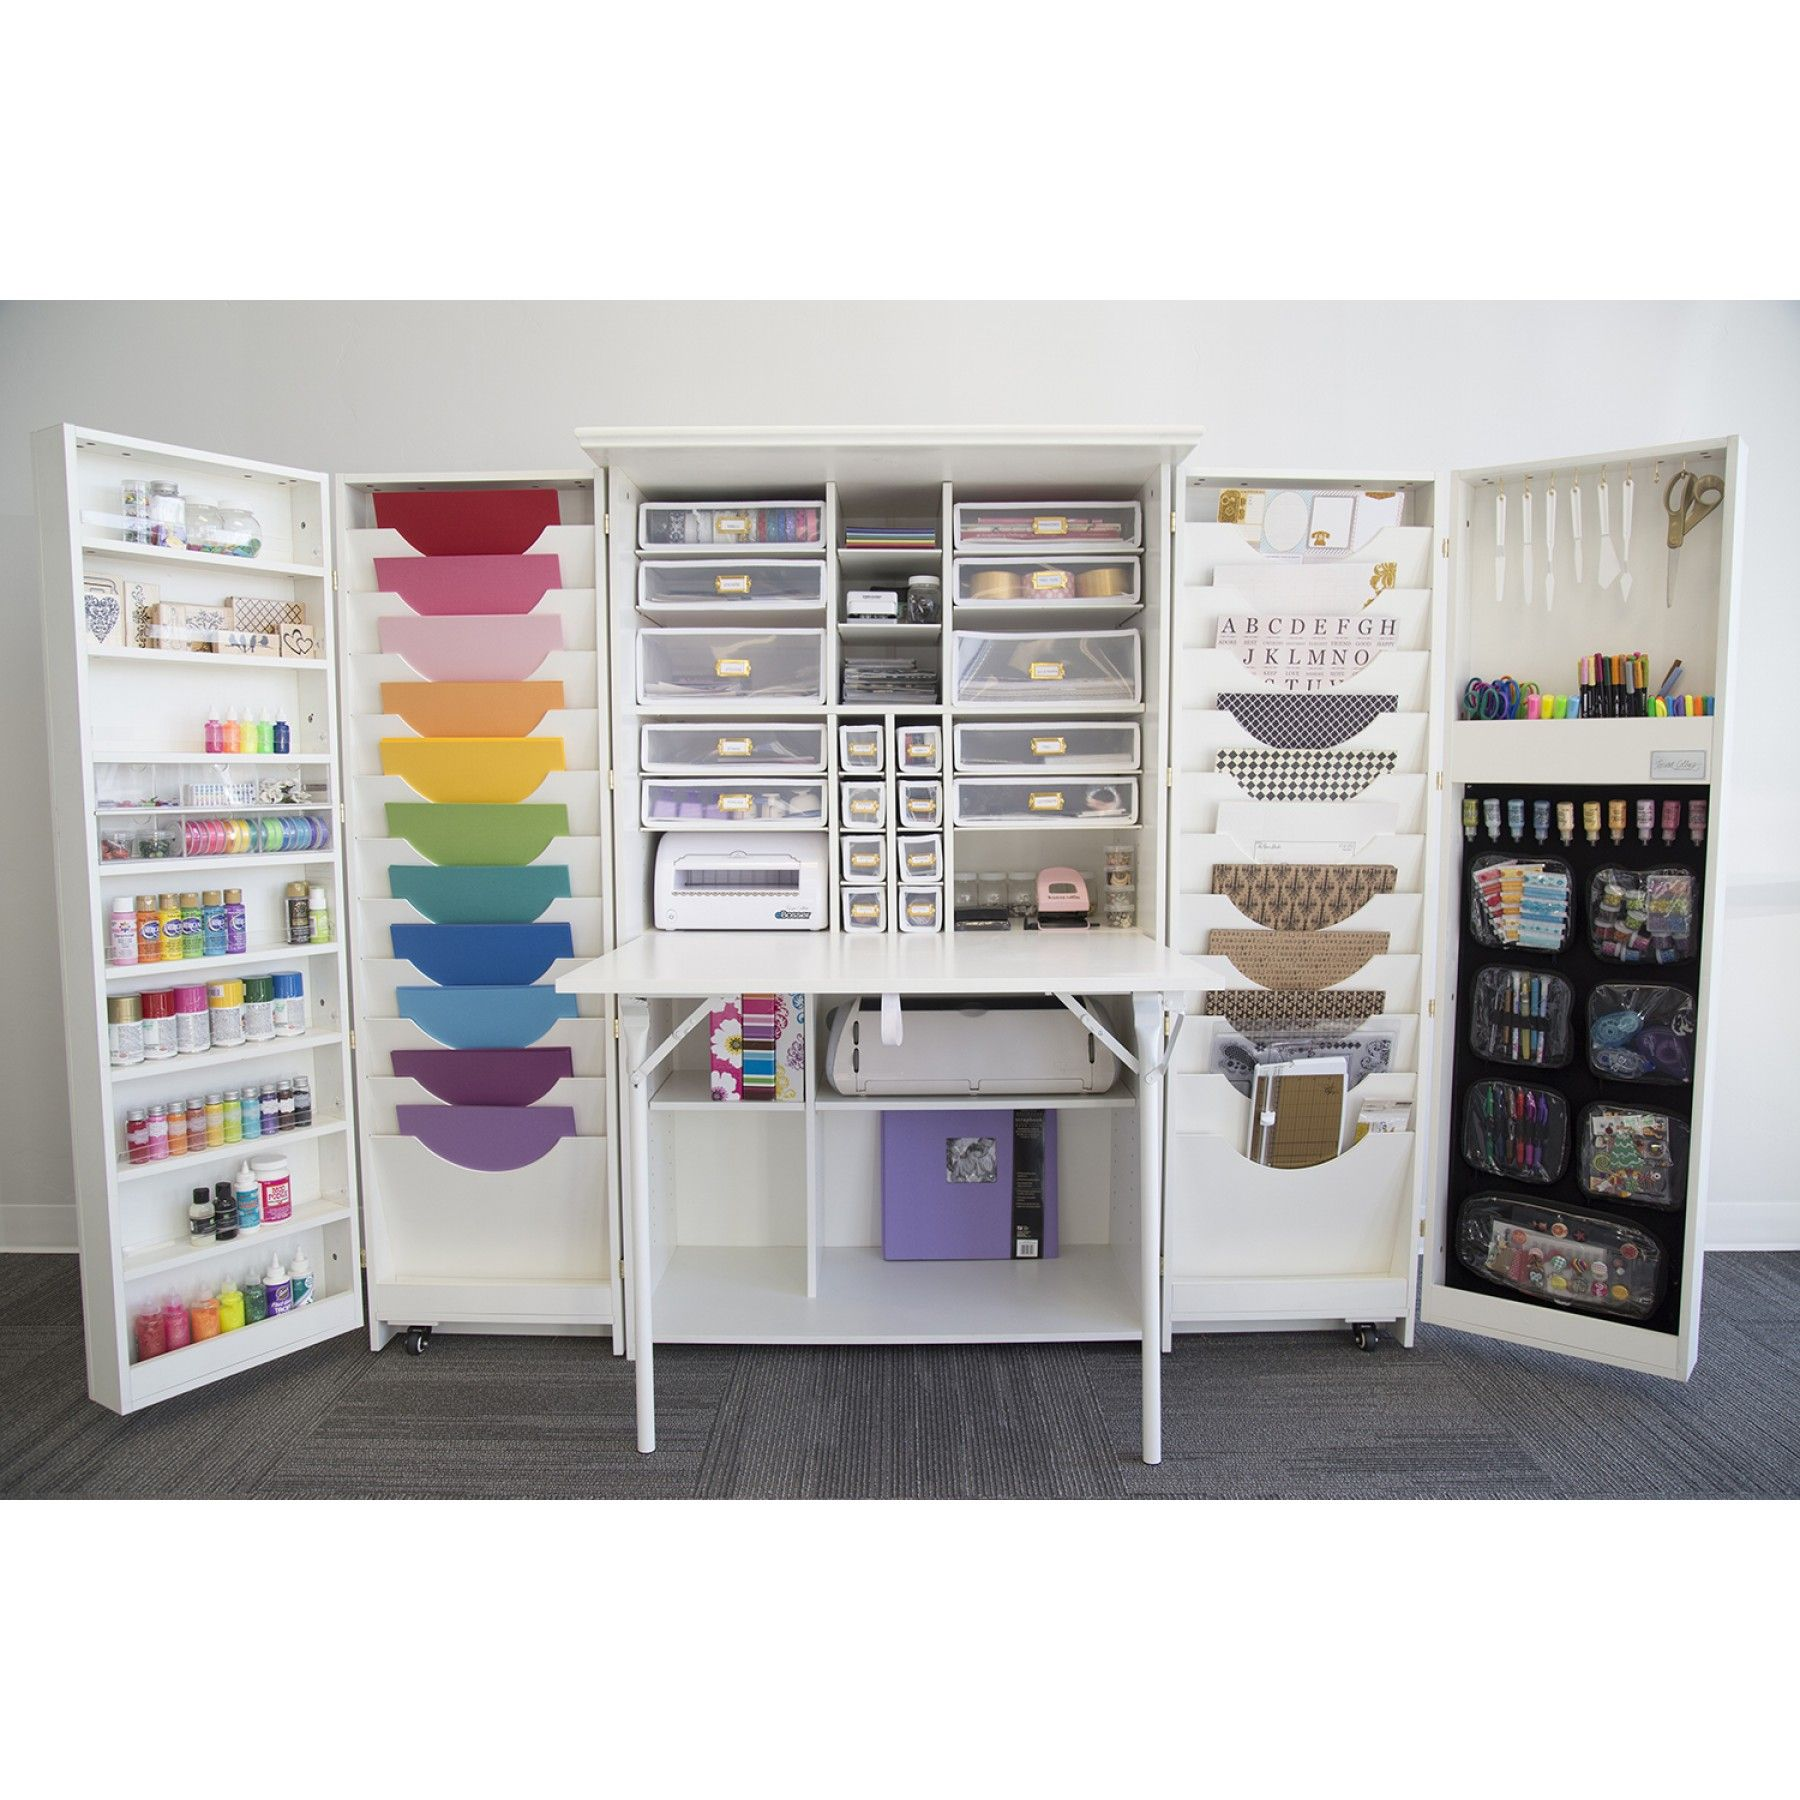 Small Room Box Kit Dhw021: Teresa Collins On Pinterest